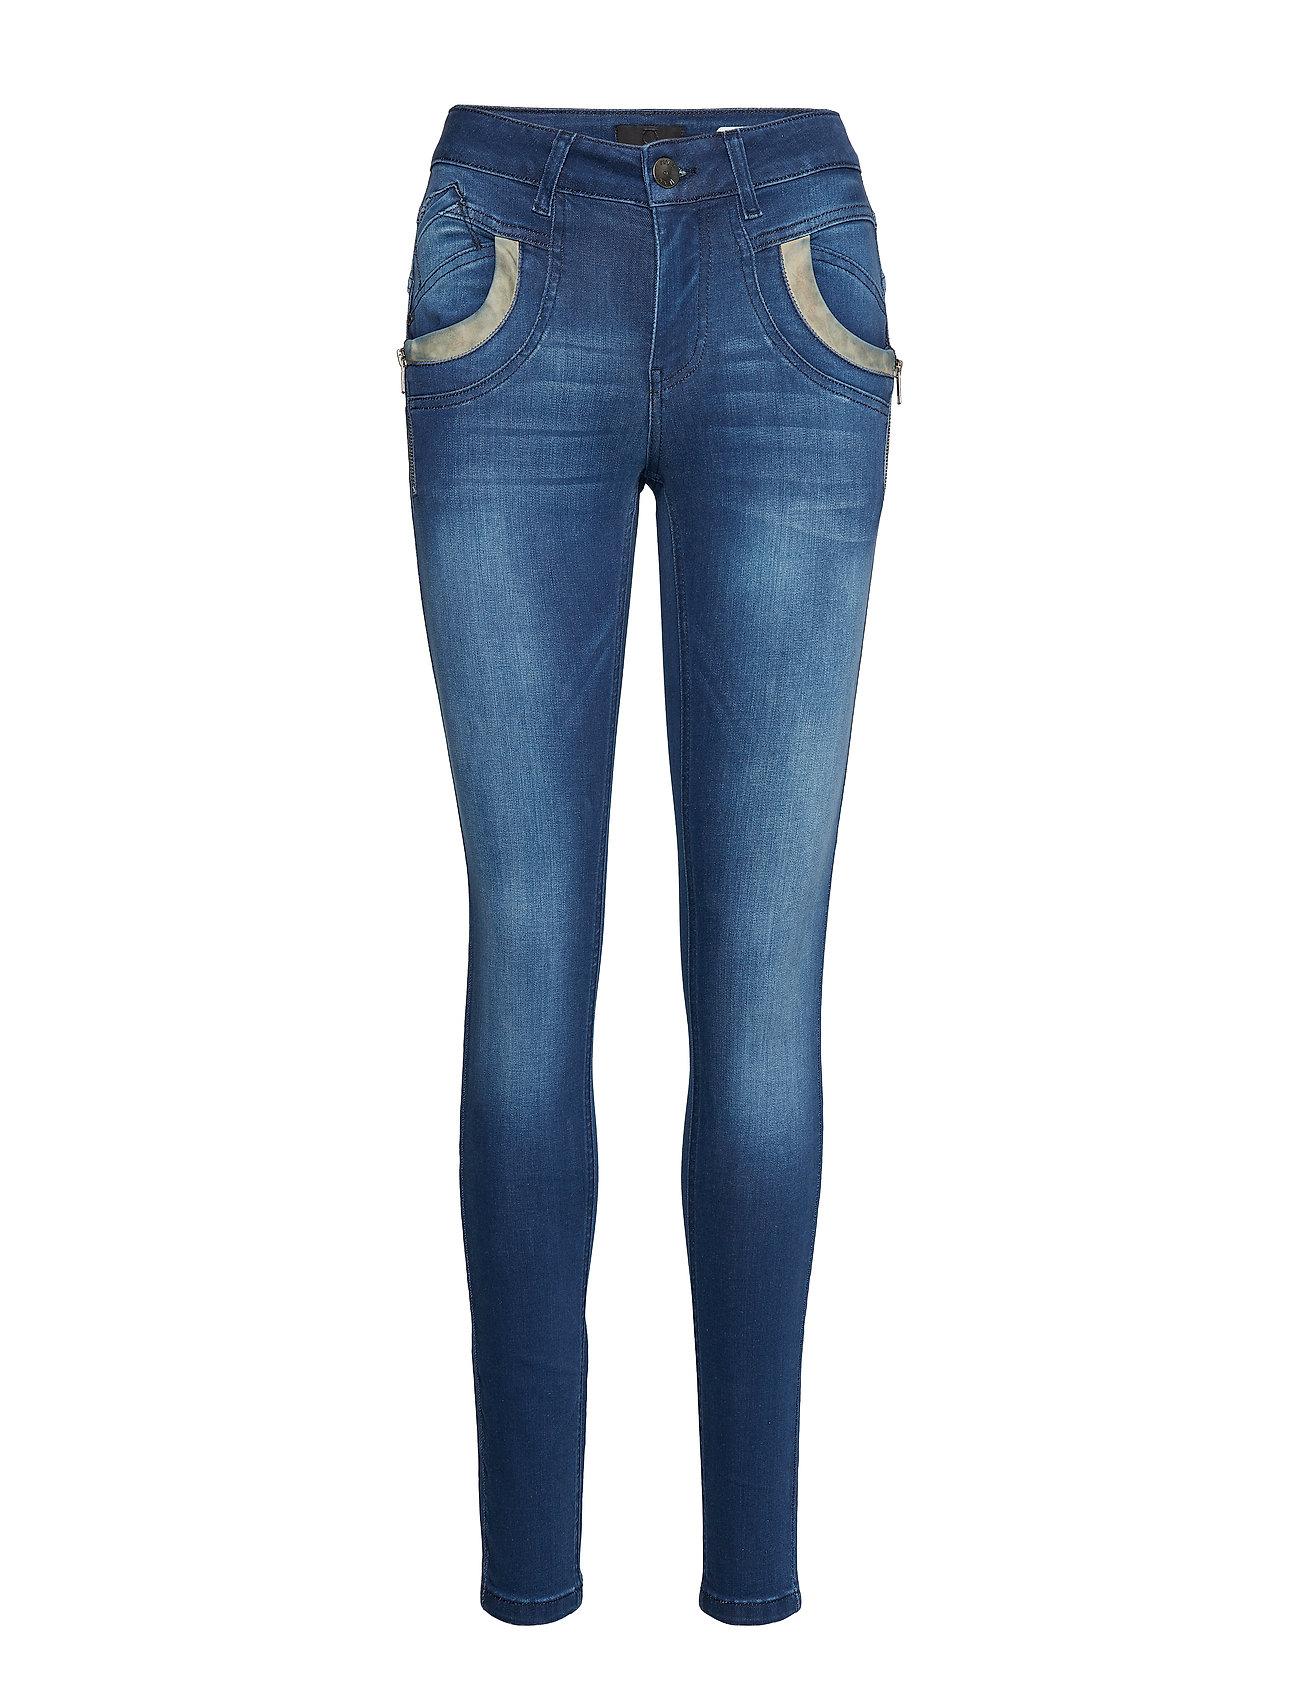 Pulz Jeans Carmen Highwaist Skinny - MEDIUM BLUE DENIM